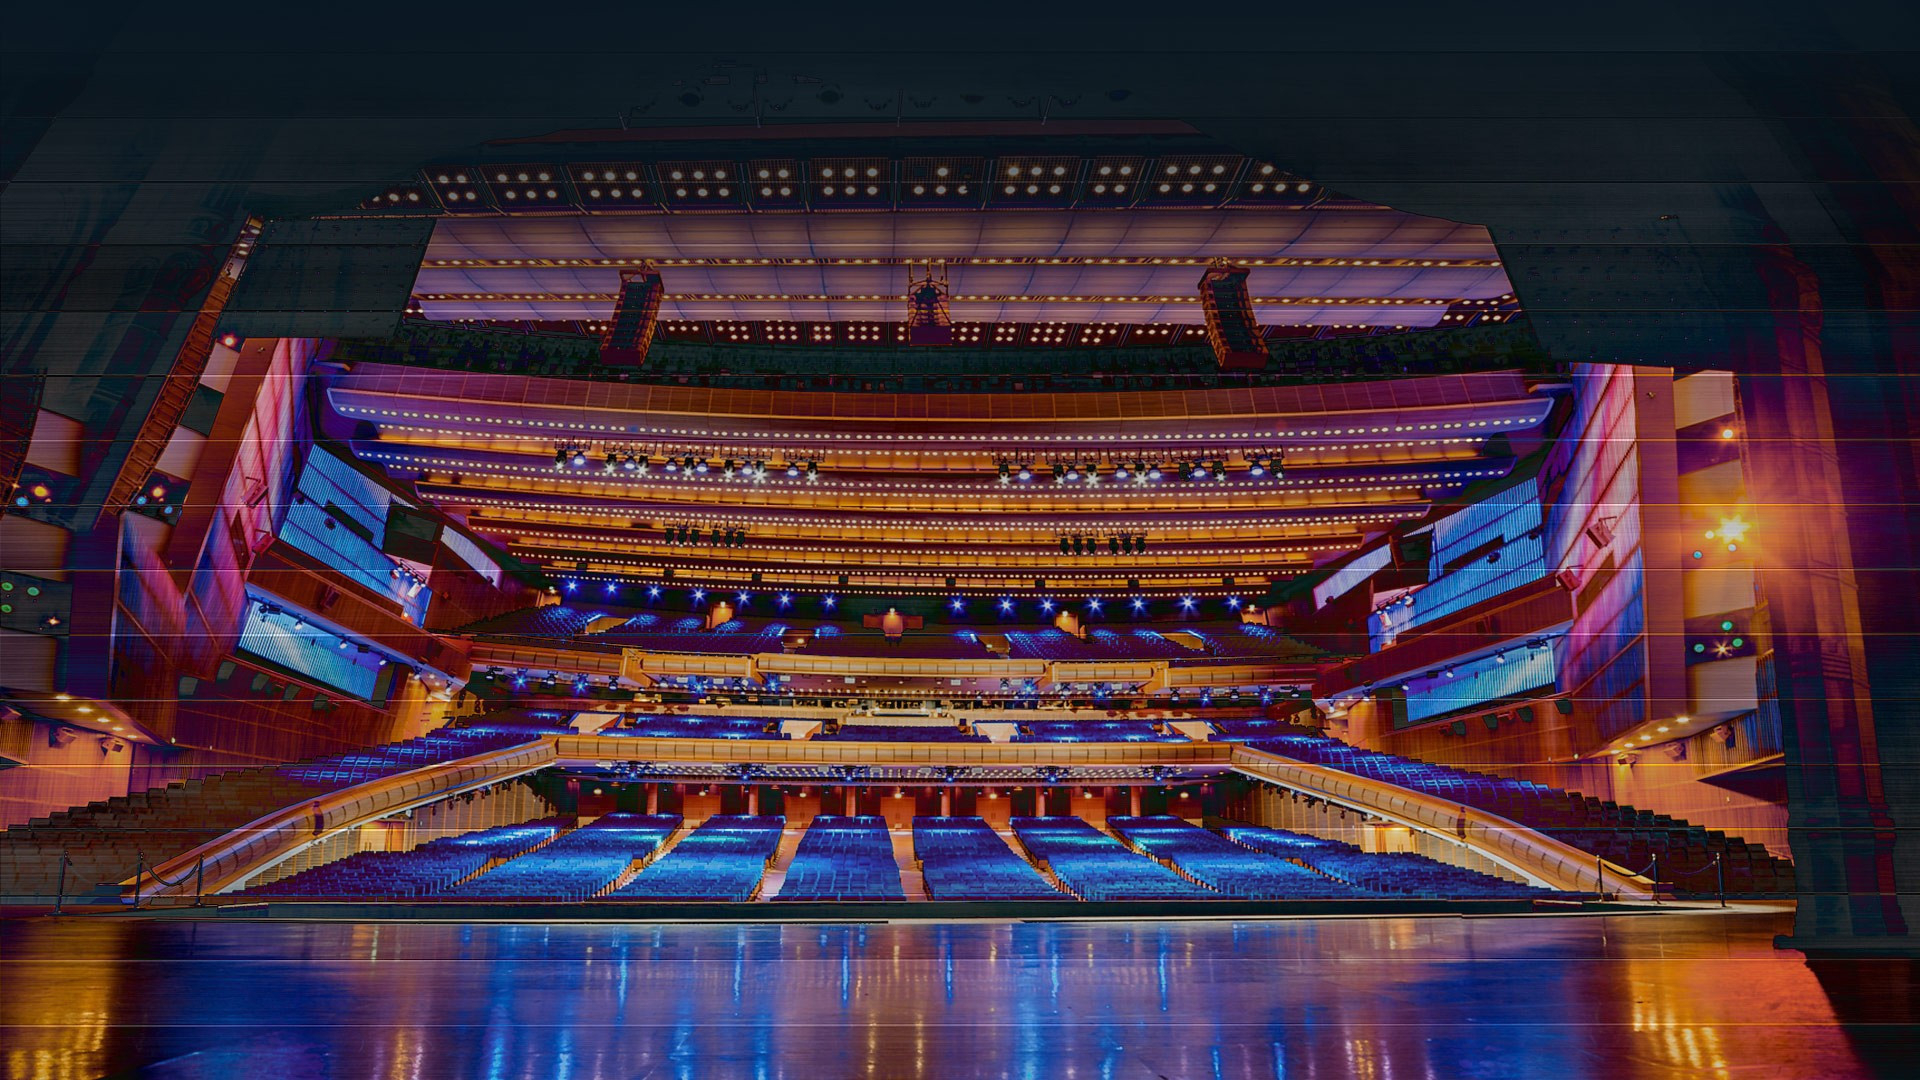 Юбилейный концерт Хора Турецкого - 30 лет